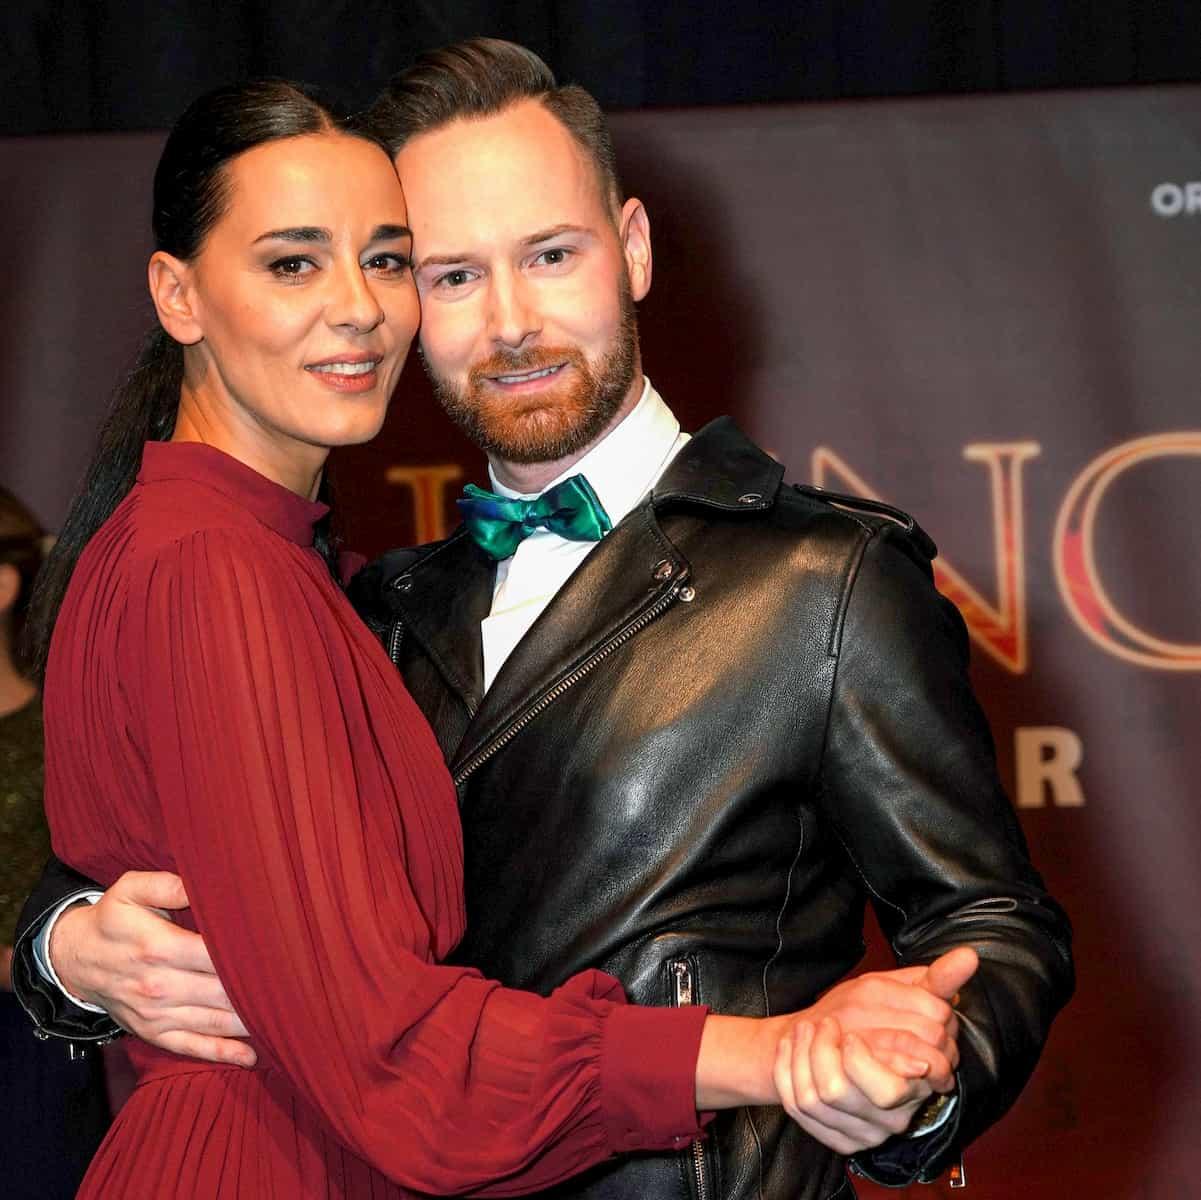 Edita Malovcic - Florian Vana als Tanzpaar bei den DancingStars 2020 dabei